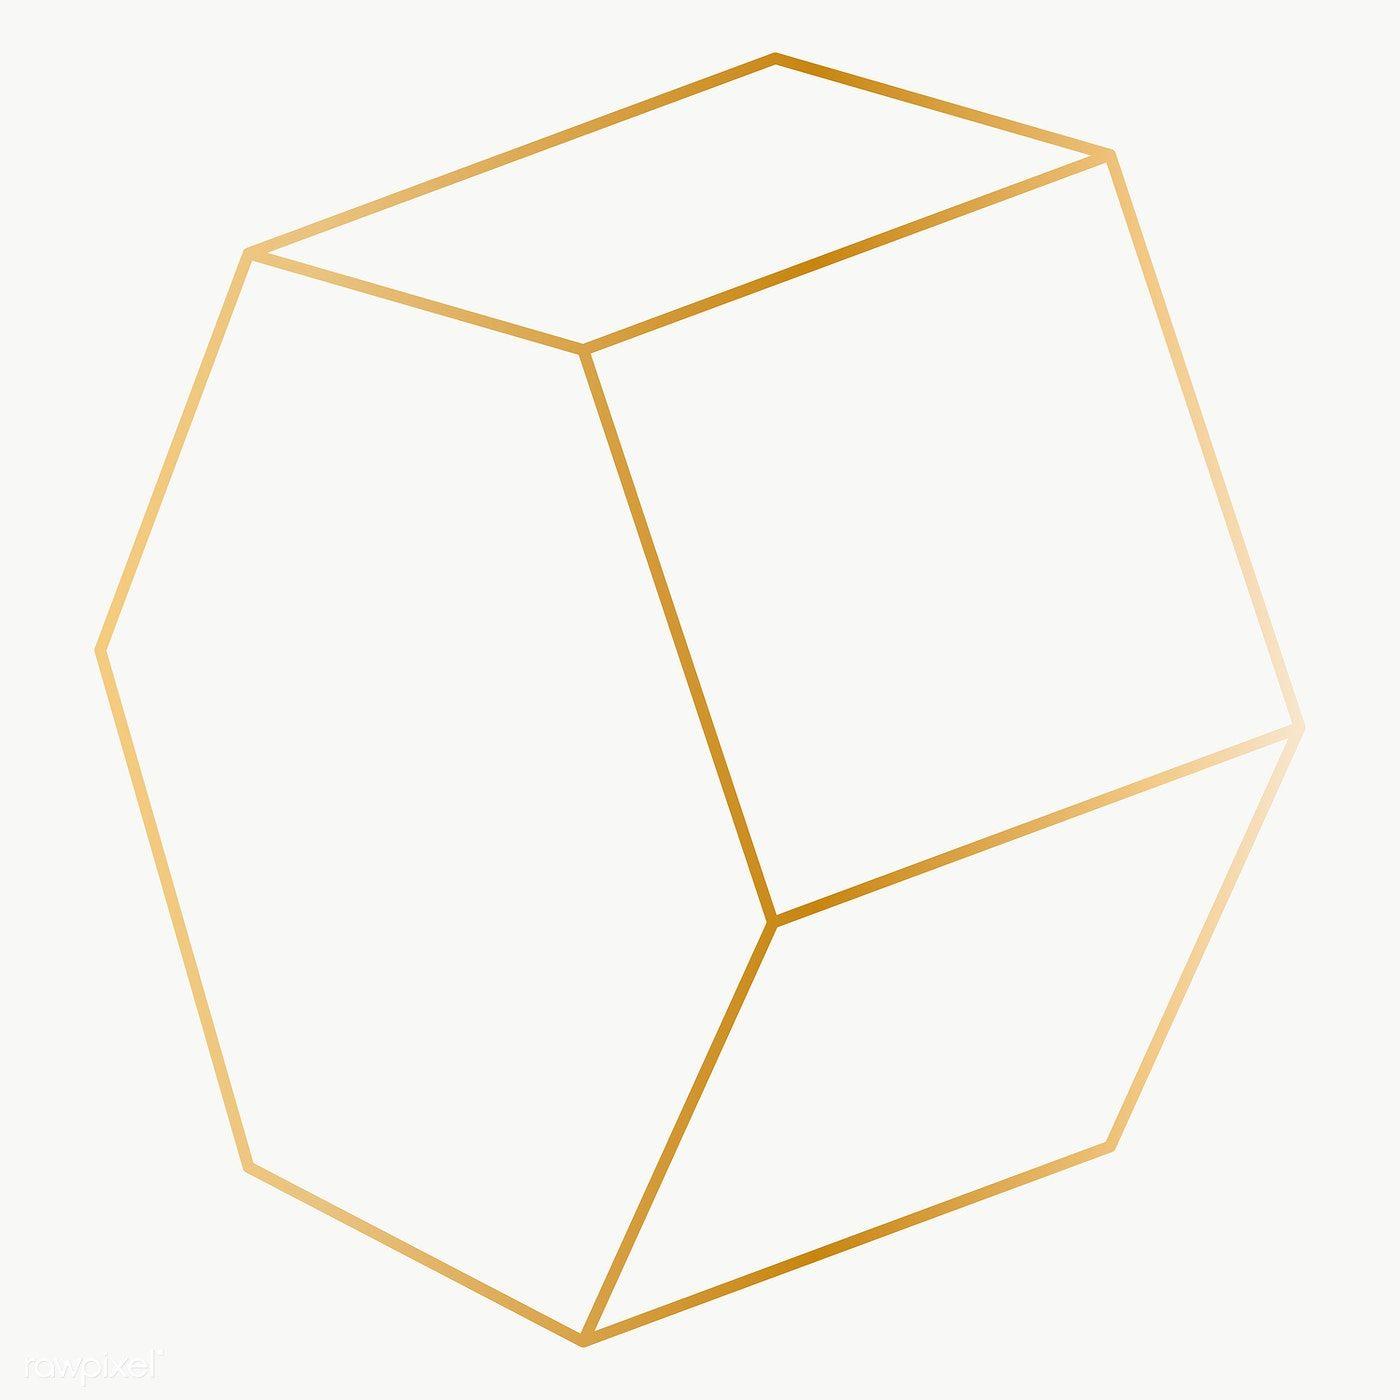 Minimal Gold Octagonal Prism Shape Transparent Png Free Image By Rawpixel Com Katie Shapes 3d Shapes For Kids Prism